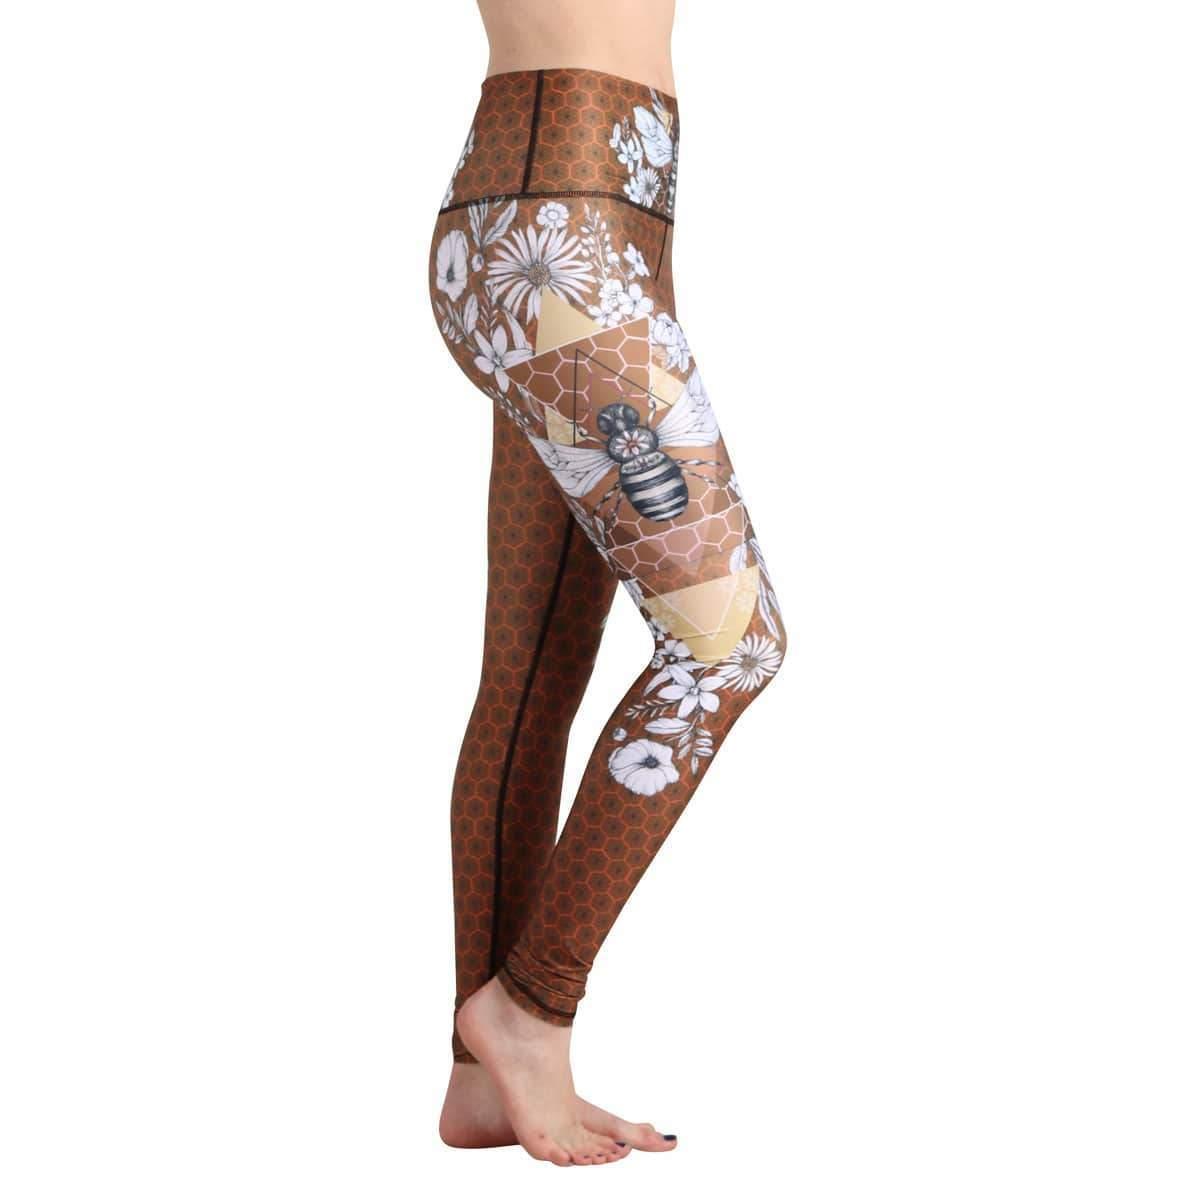 yoga-legging-eco-friendly-sweat-wicking-min.jpg